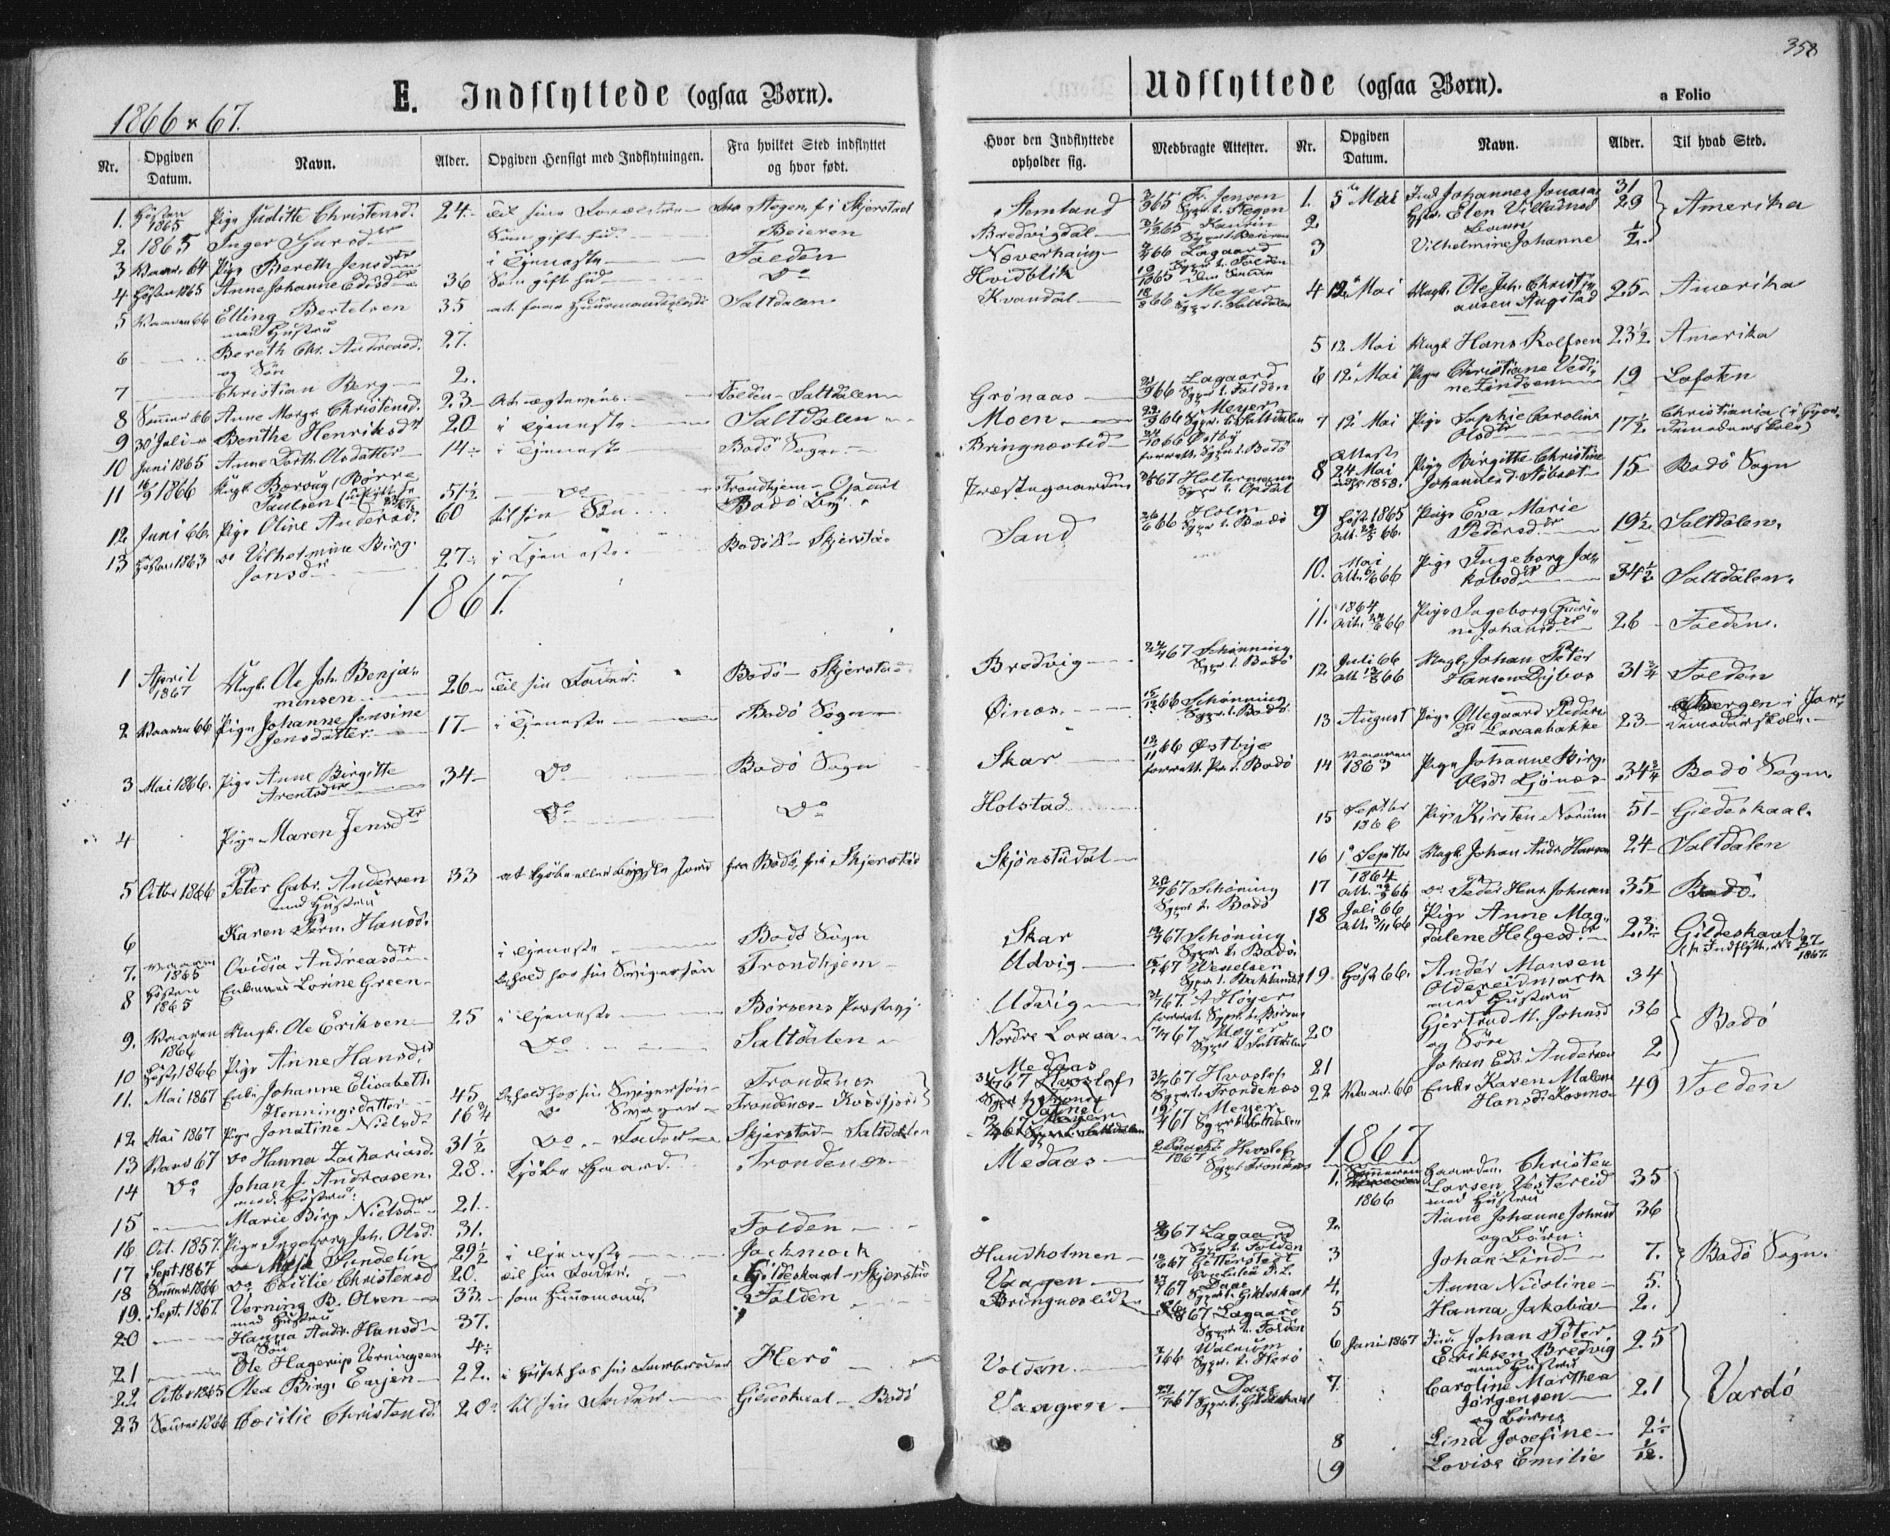 SAT, Ministerialprotokoller, klokkerbøker og fødselsregistre - Nordland, 852/L0739: Ministerialbok nr. 852A09, 1866-1877, s. 358